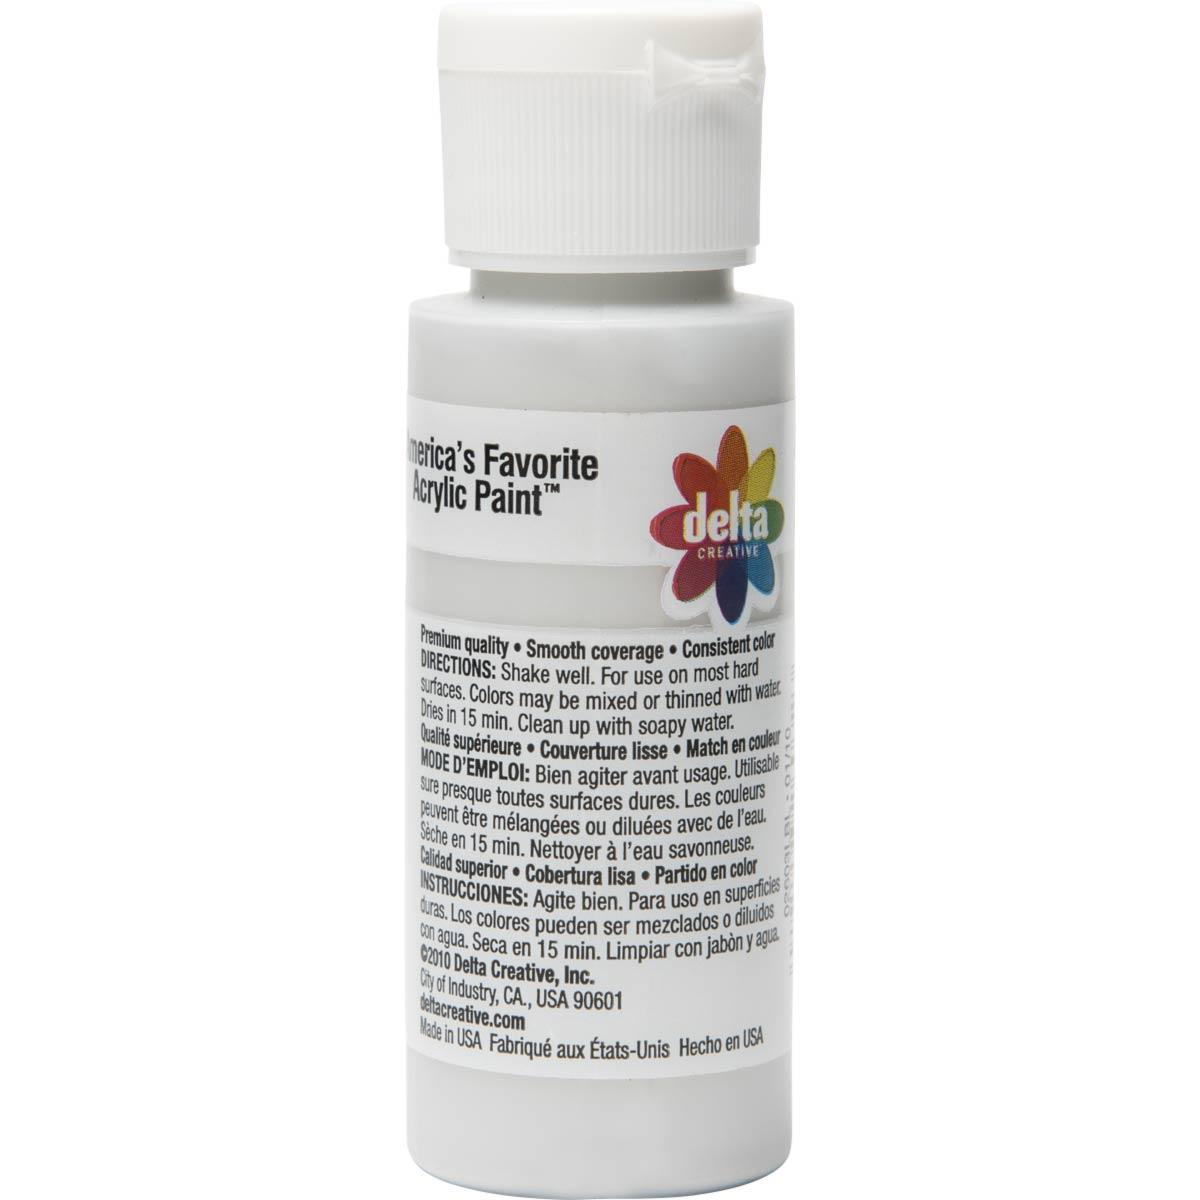 Delta Ceramcoat ® Acrylic Paint - Metallic Silver, 2 oz. - 026030202W